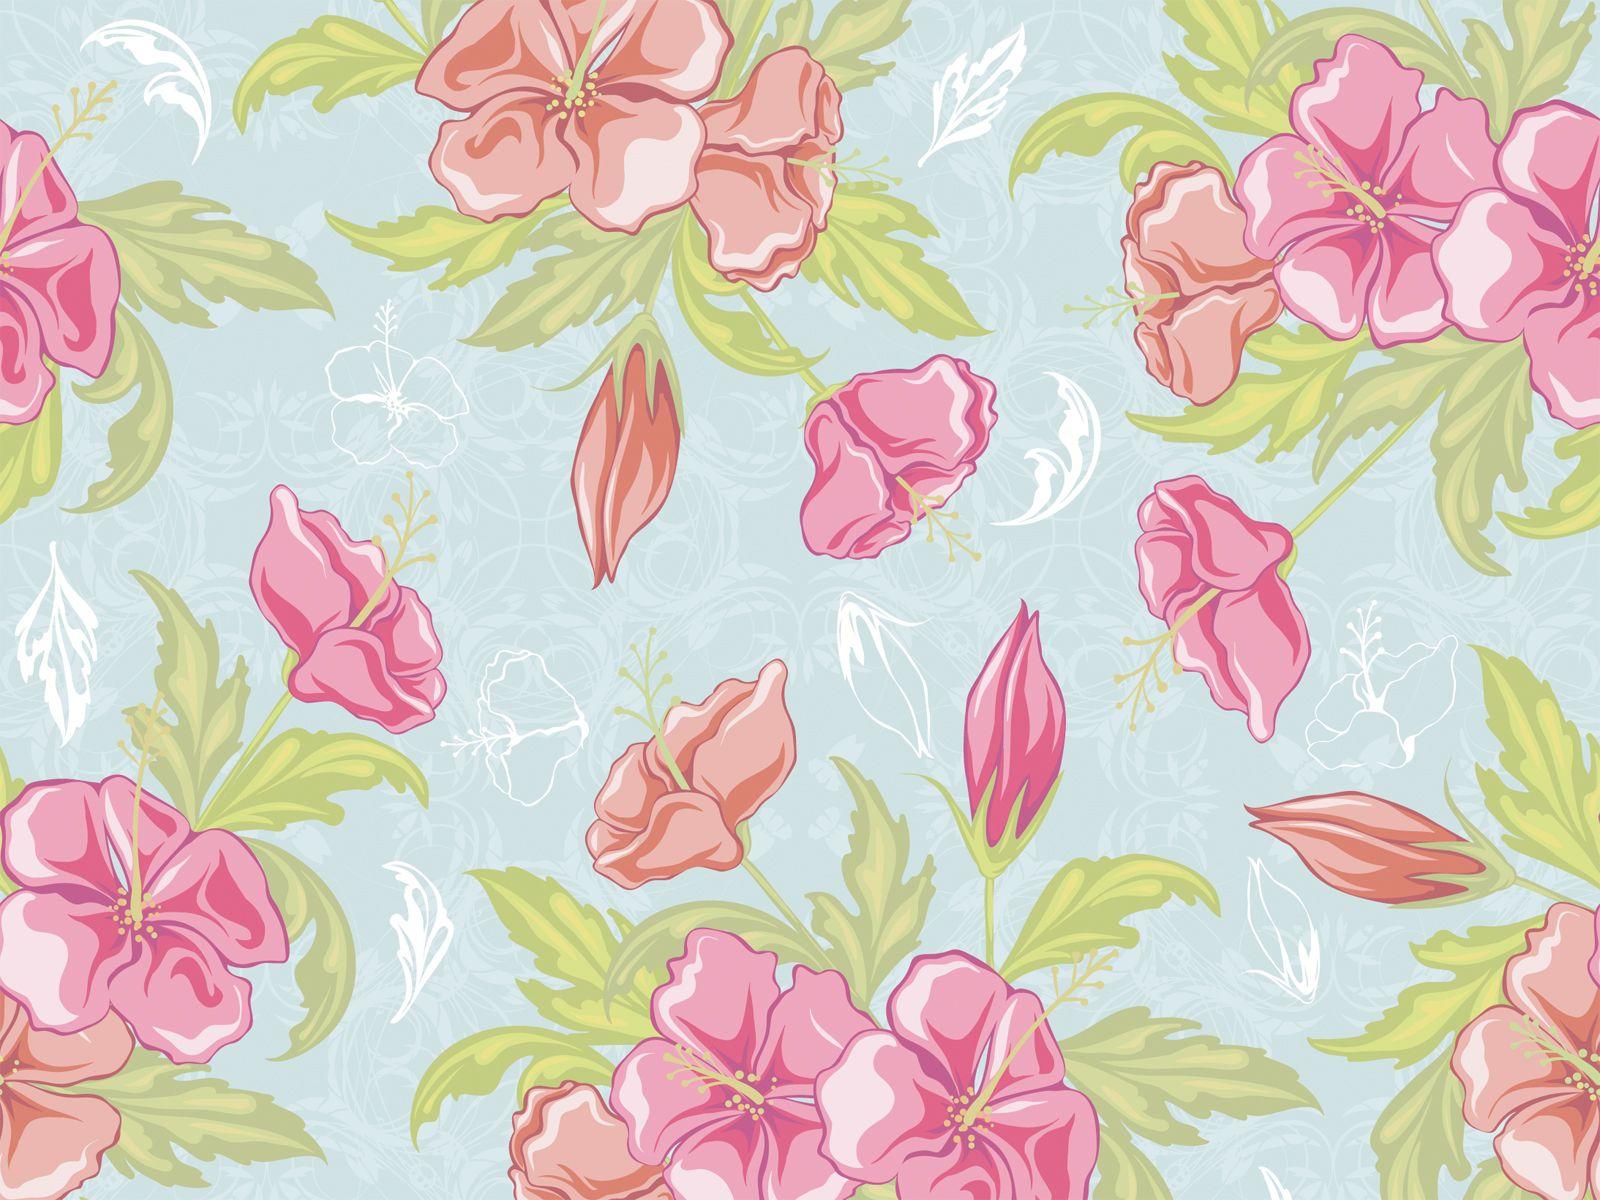 Vintage Seamless Flower Vector Background Jpg 1600 1200